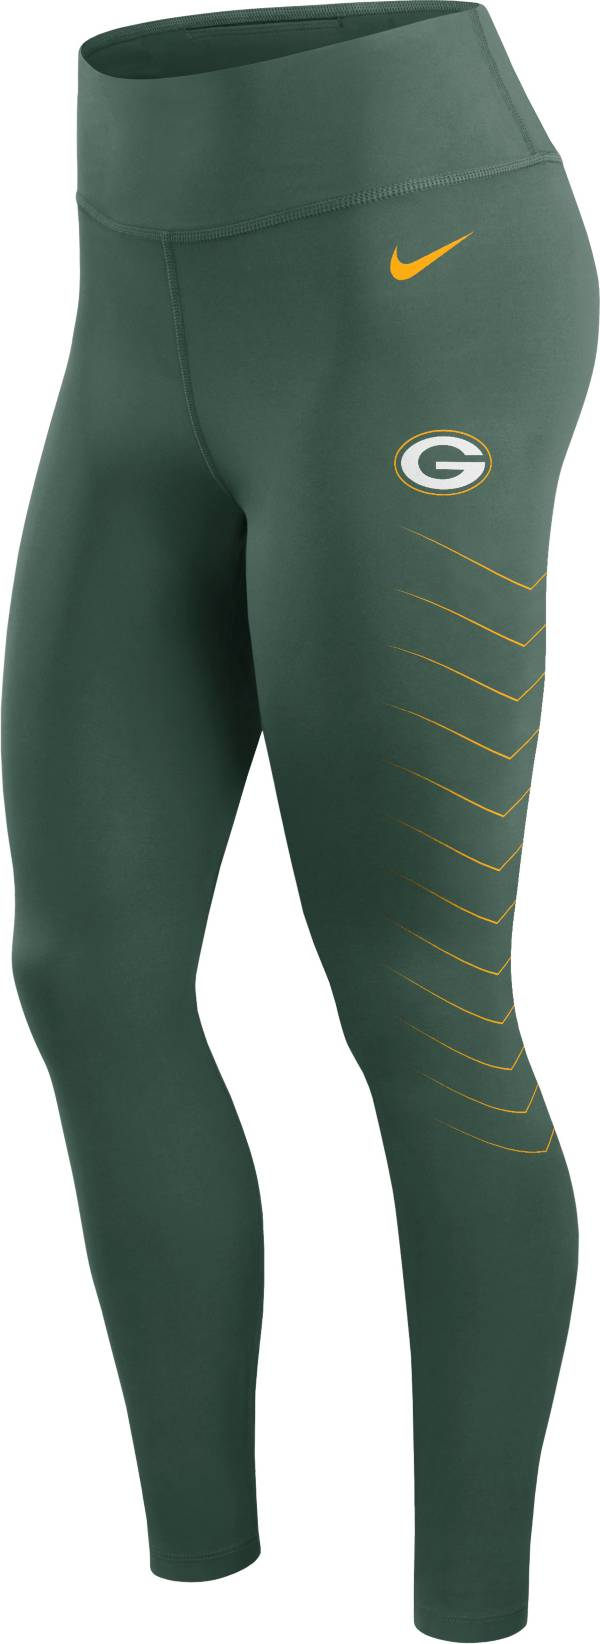 Nike Women's Green Bay Packers Dri-FIT Green Performance Leggings product image